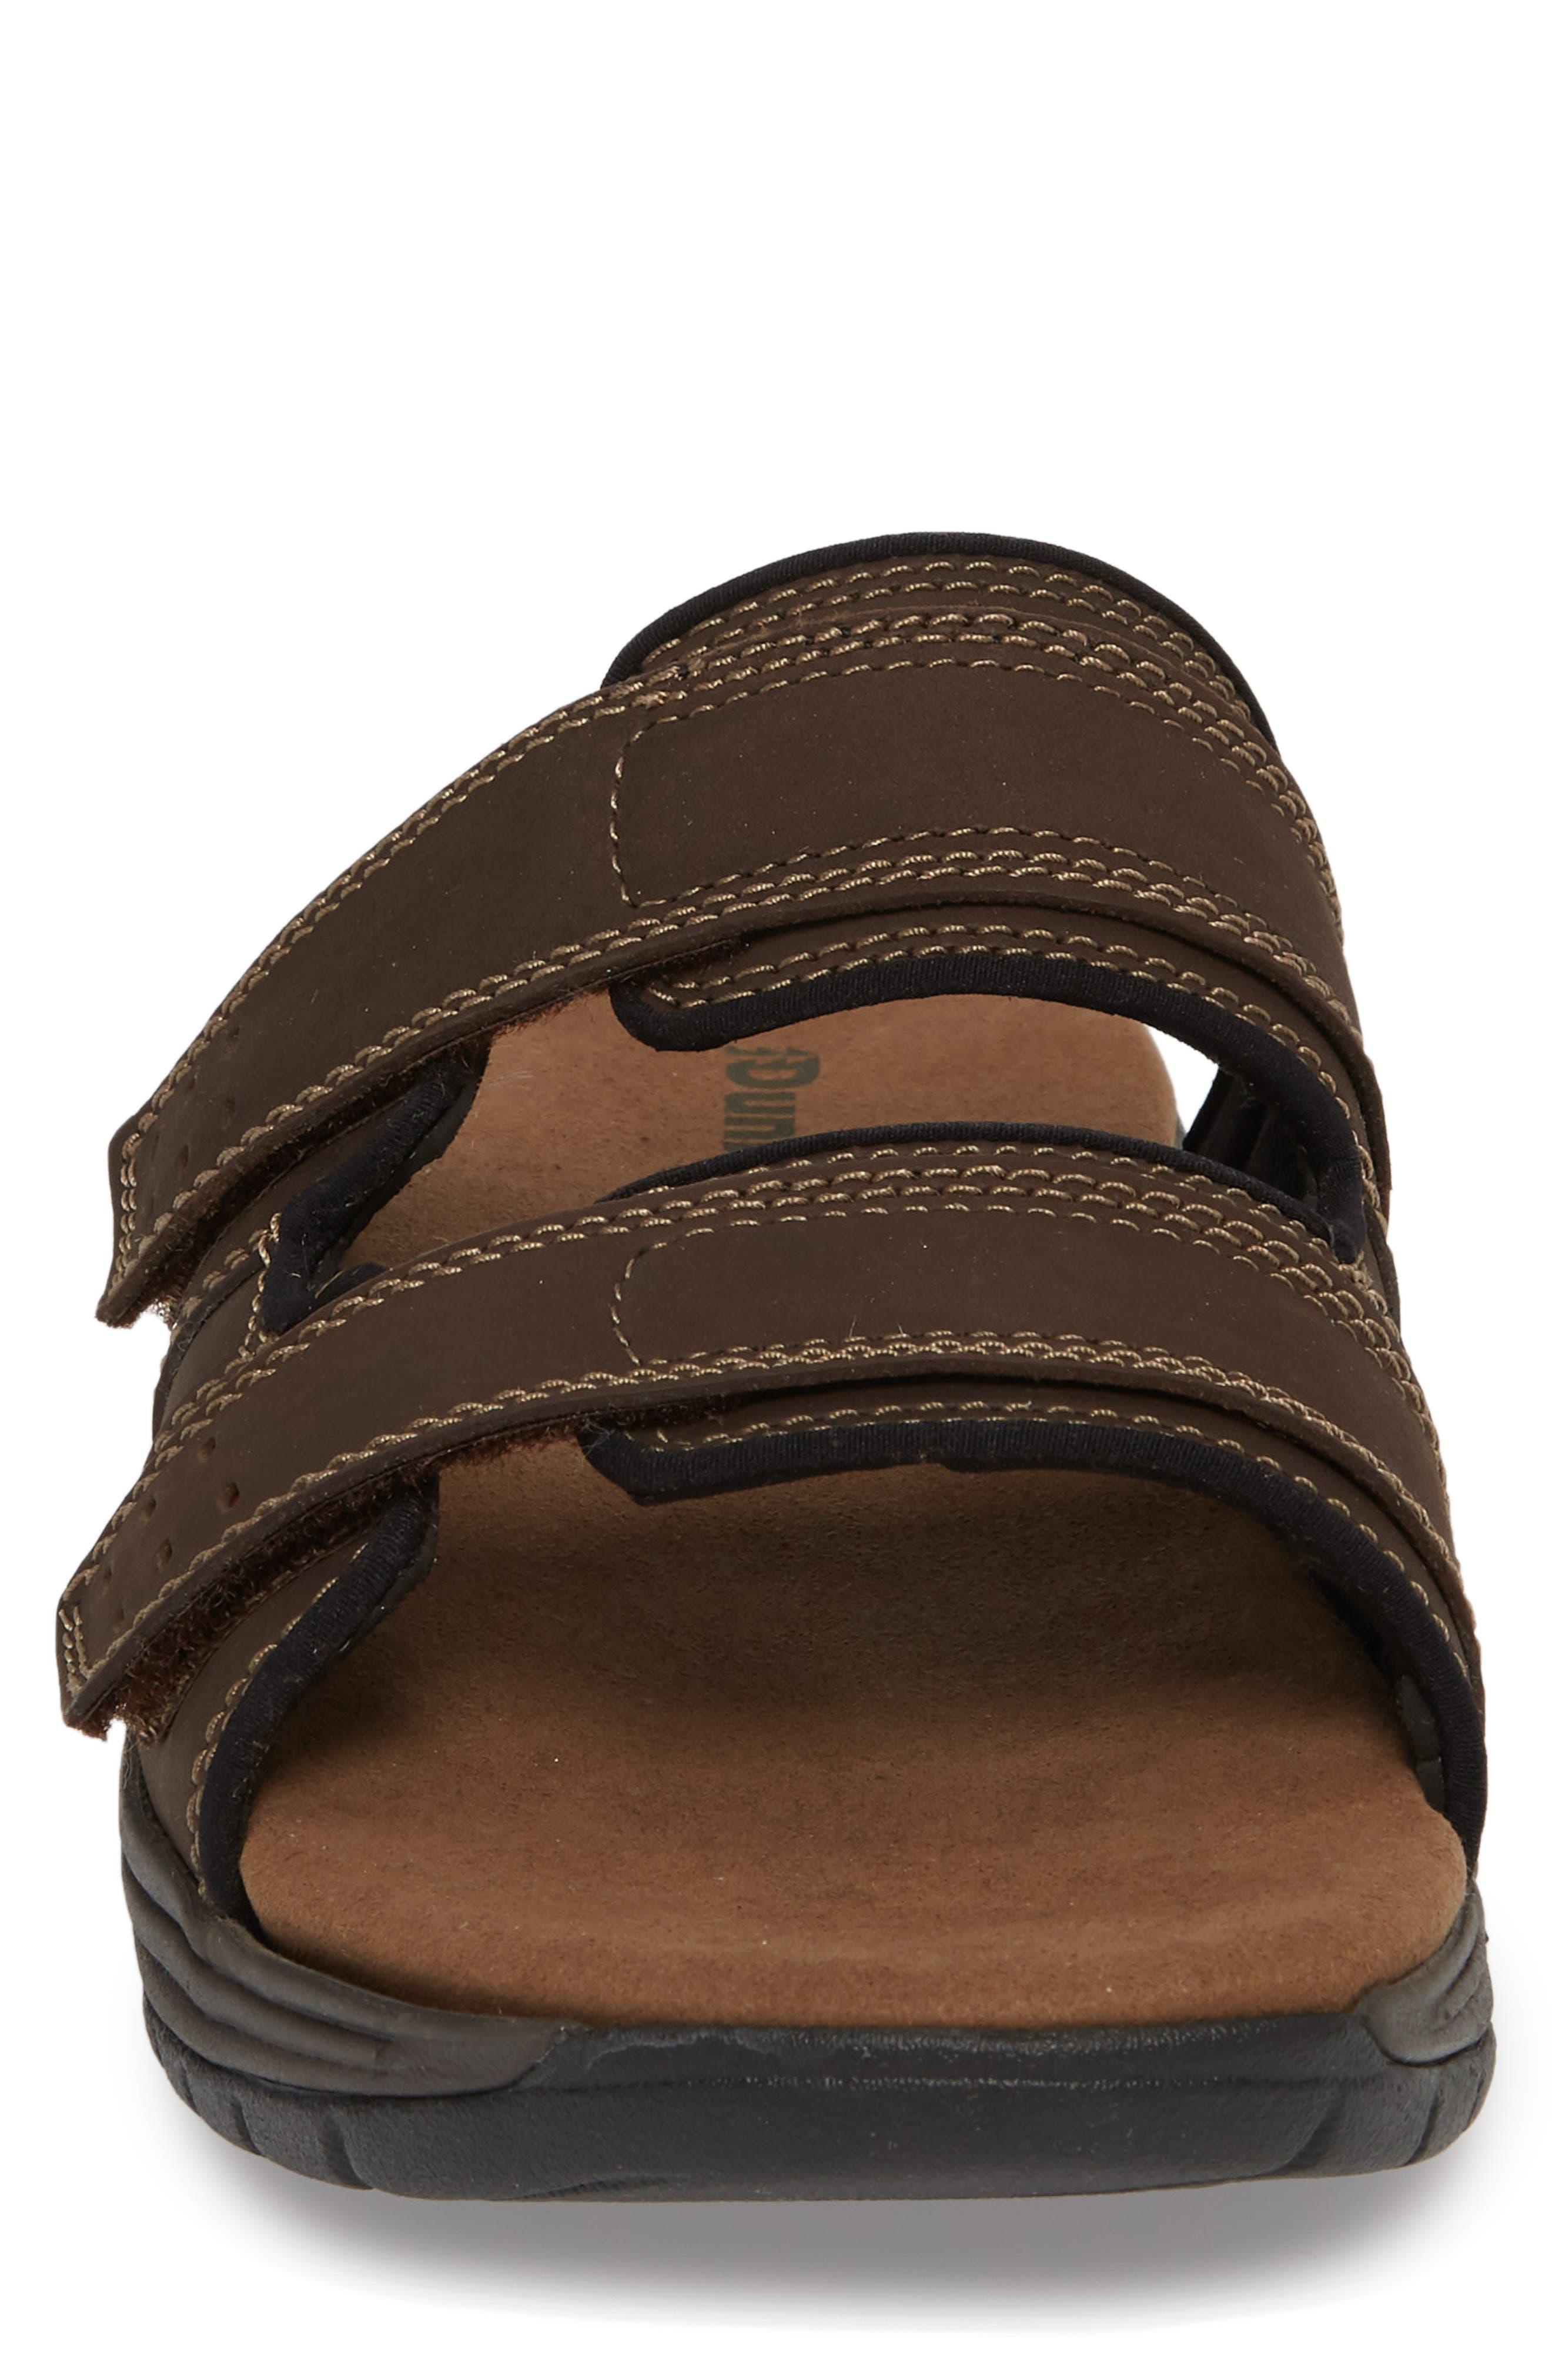 Newport Slide Sandal,                             Alternate thumbnail 4, color,                             DARK BROWN LEATHER